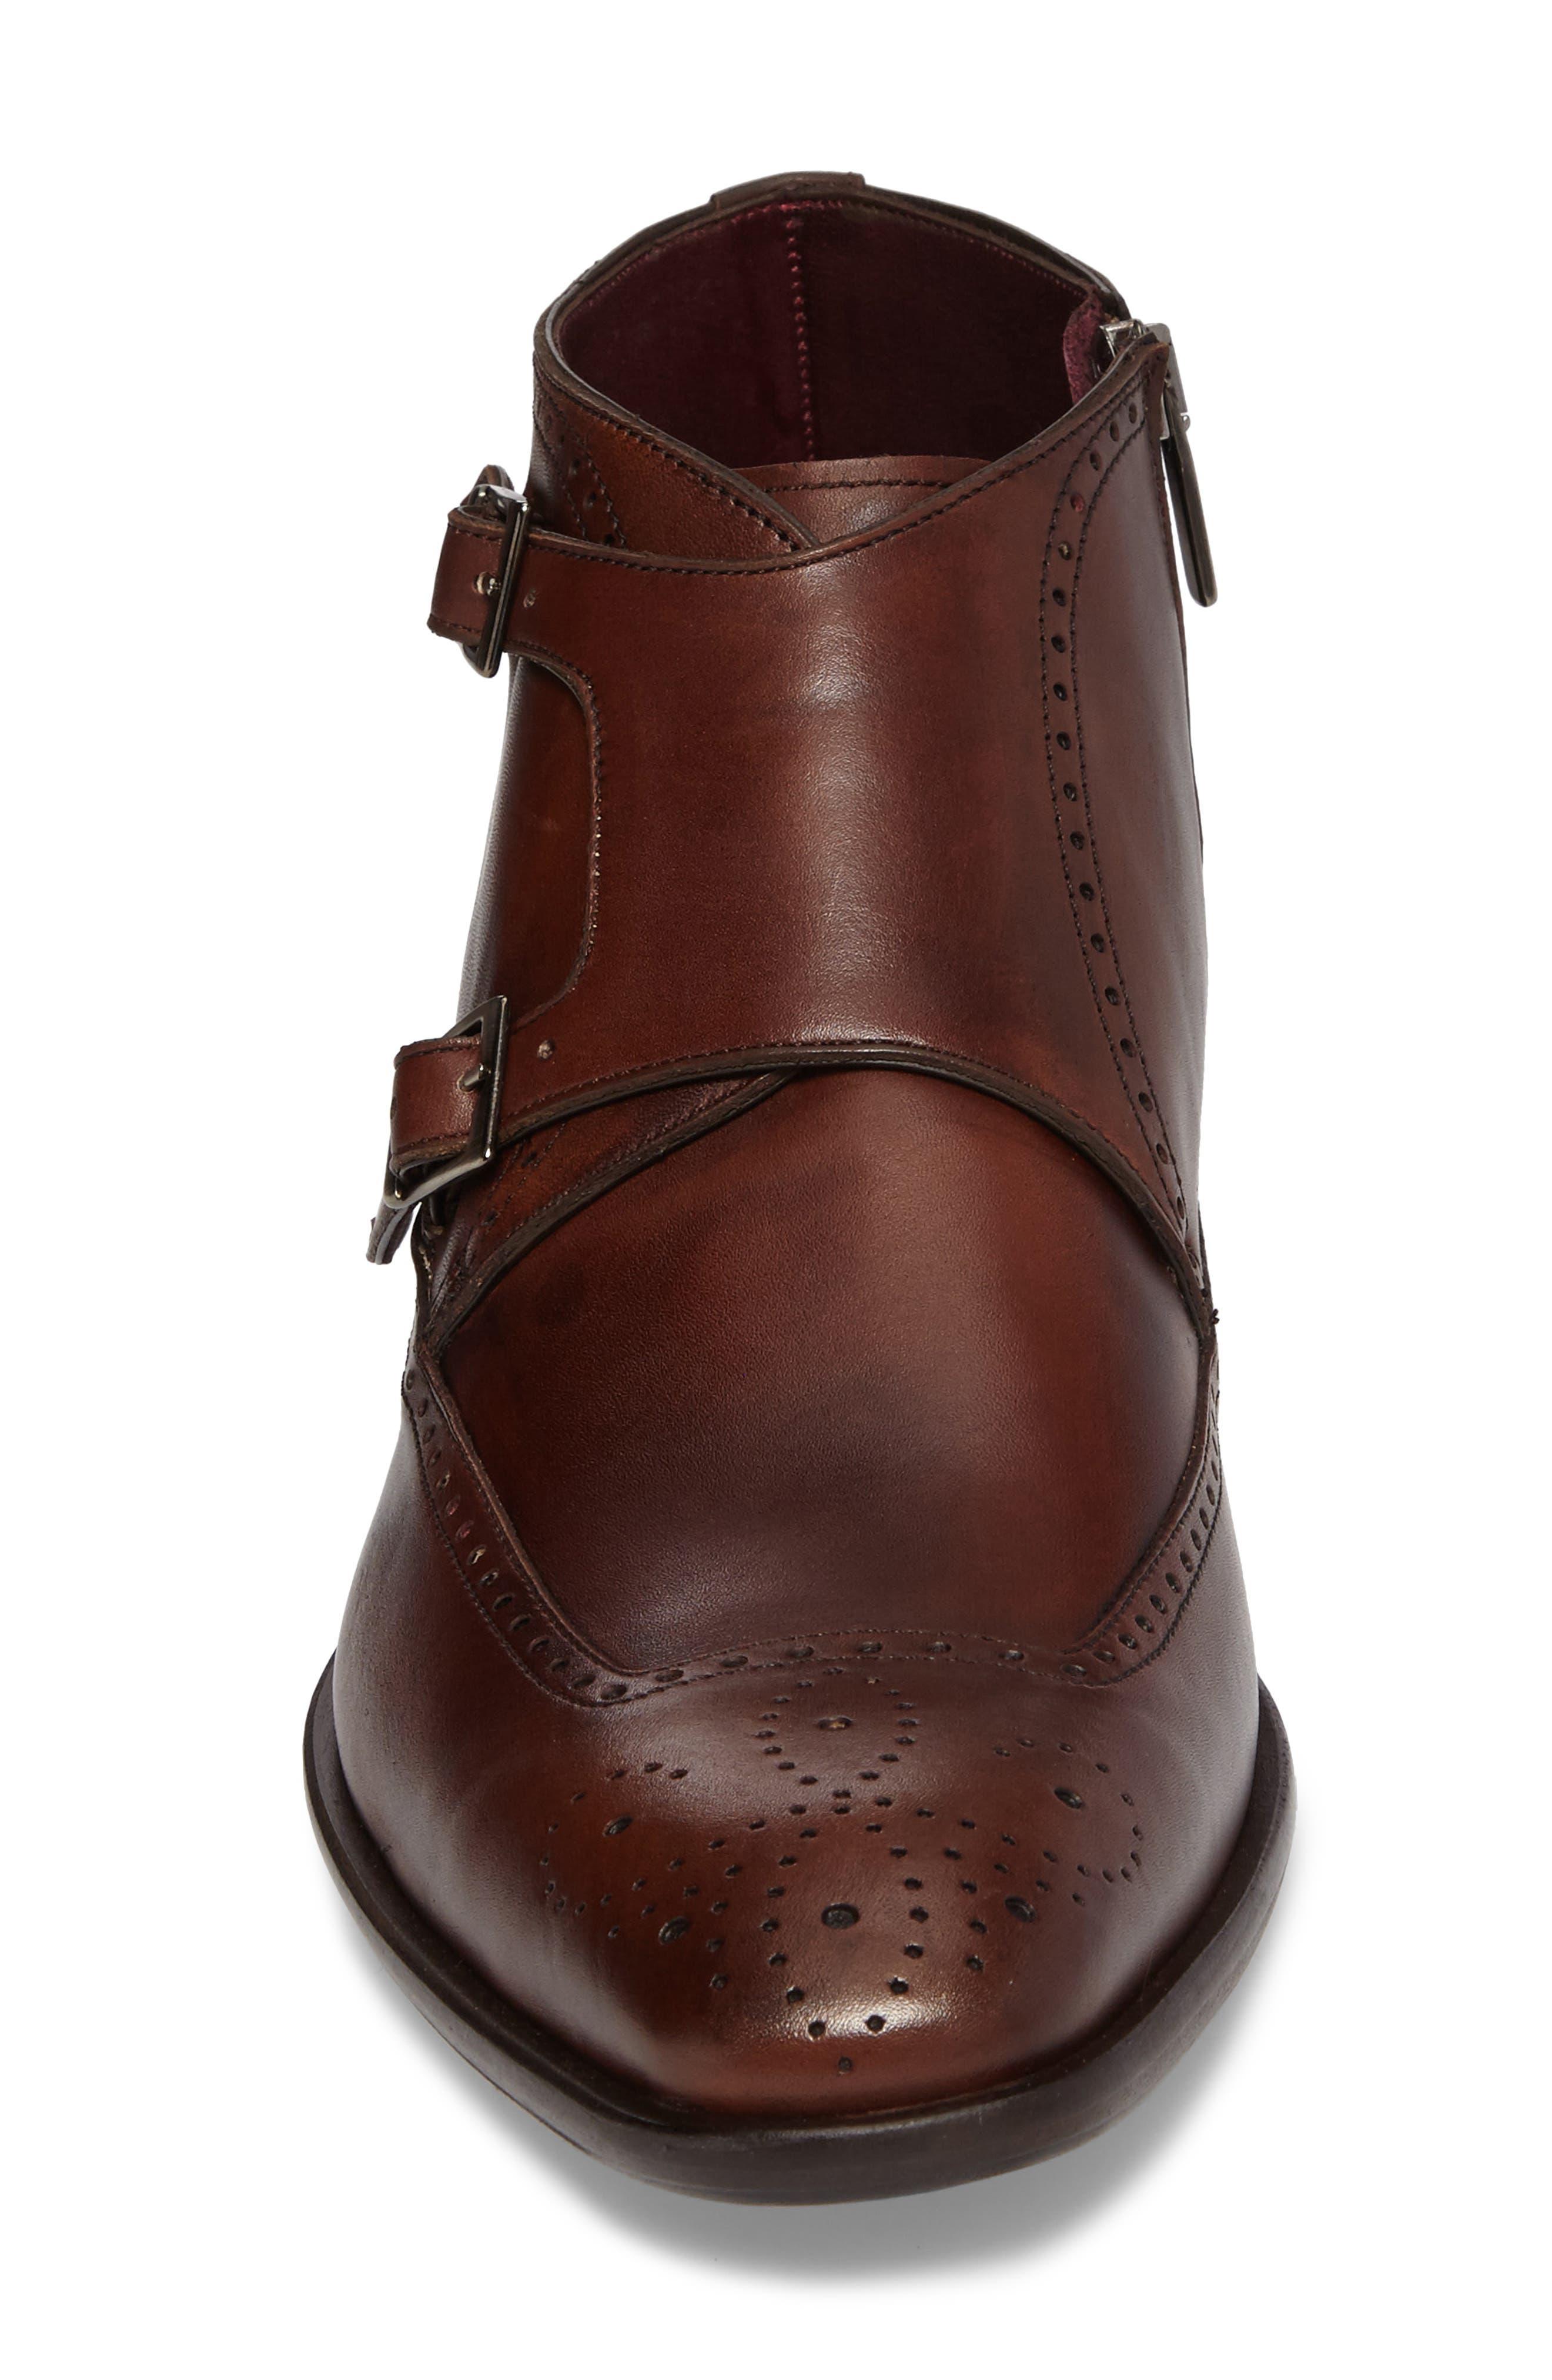 Taberna Double Monk Strap Boot,                             Alternate thumbnail 4, color,                             Cognac Leather